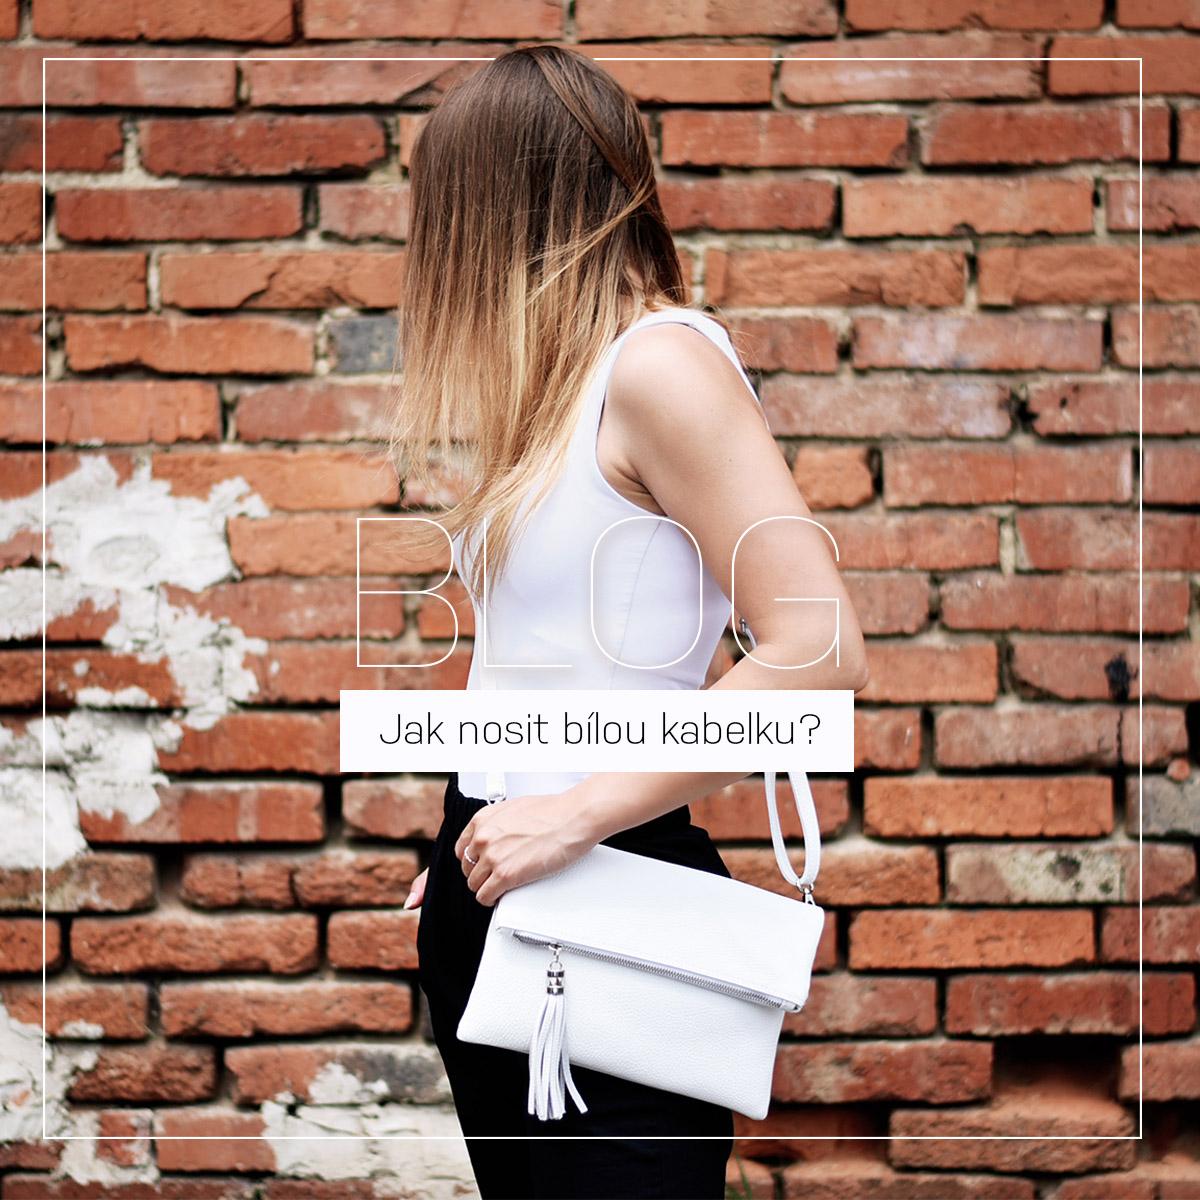 Jak nosit bílou kabelku? | BLAIRE BAREVNÉ SÉRIE